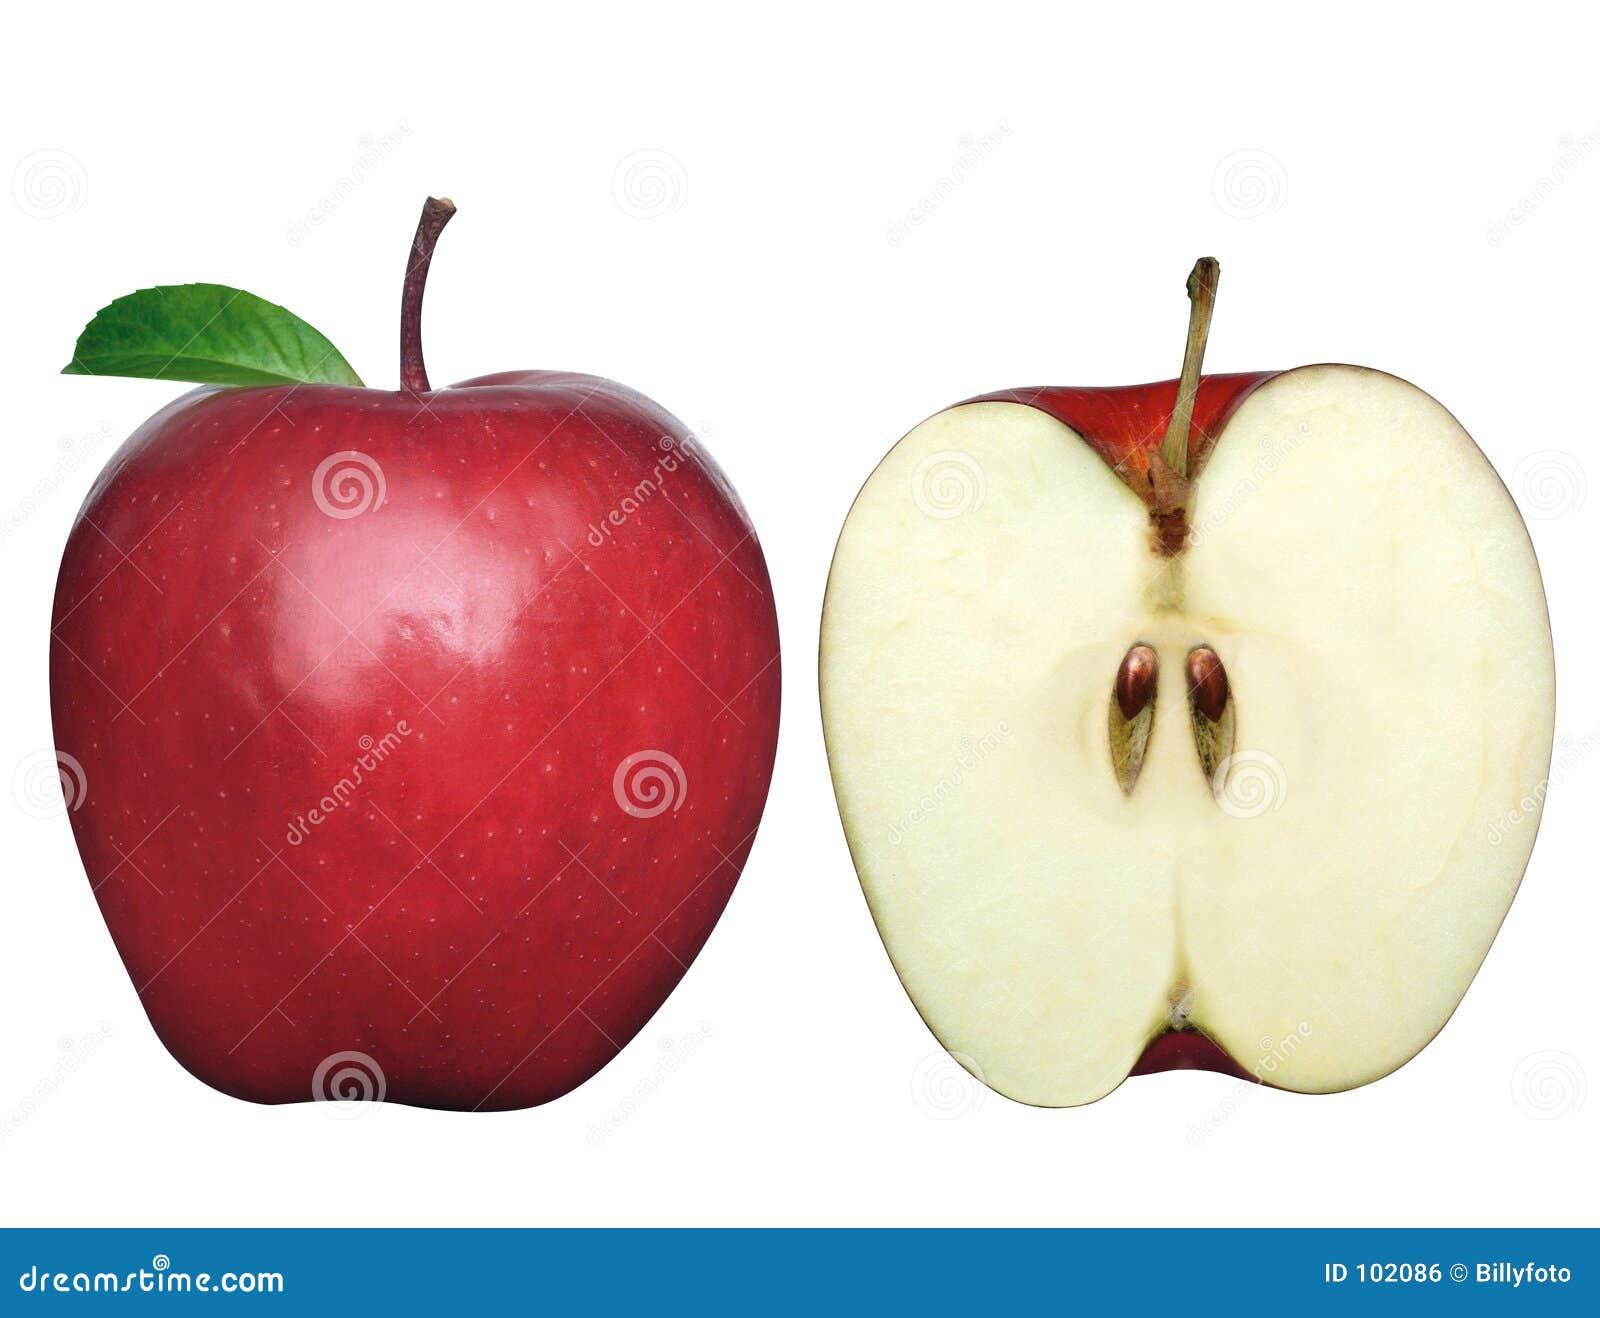 Zwei apples-2